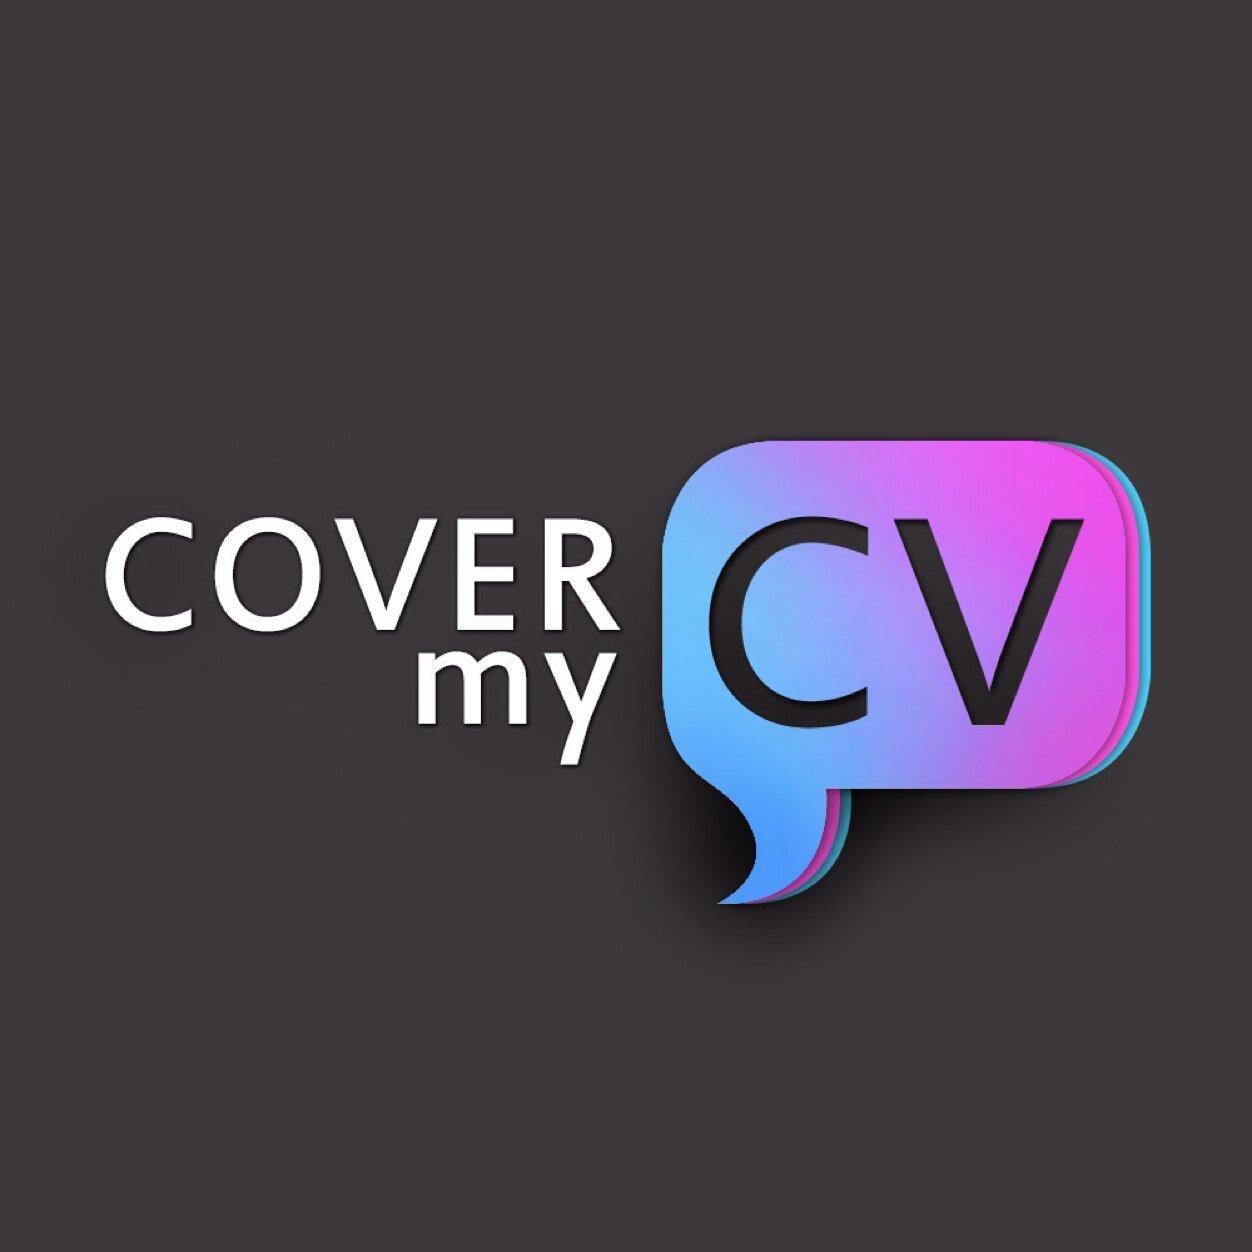 cmc   covermycv